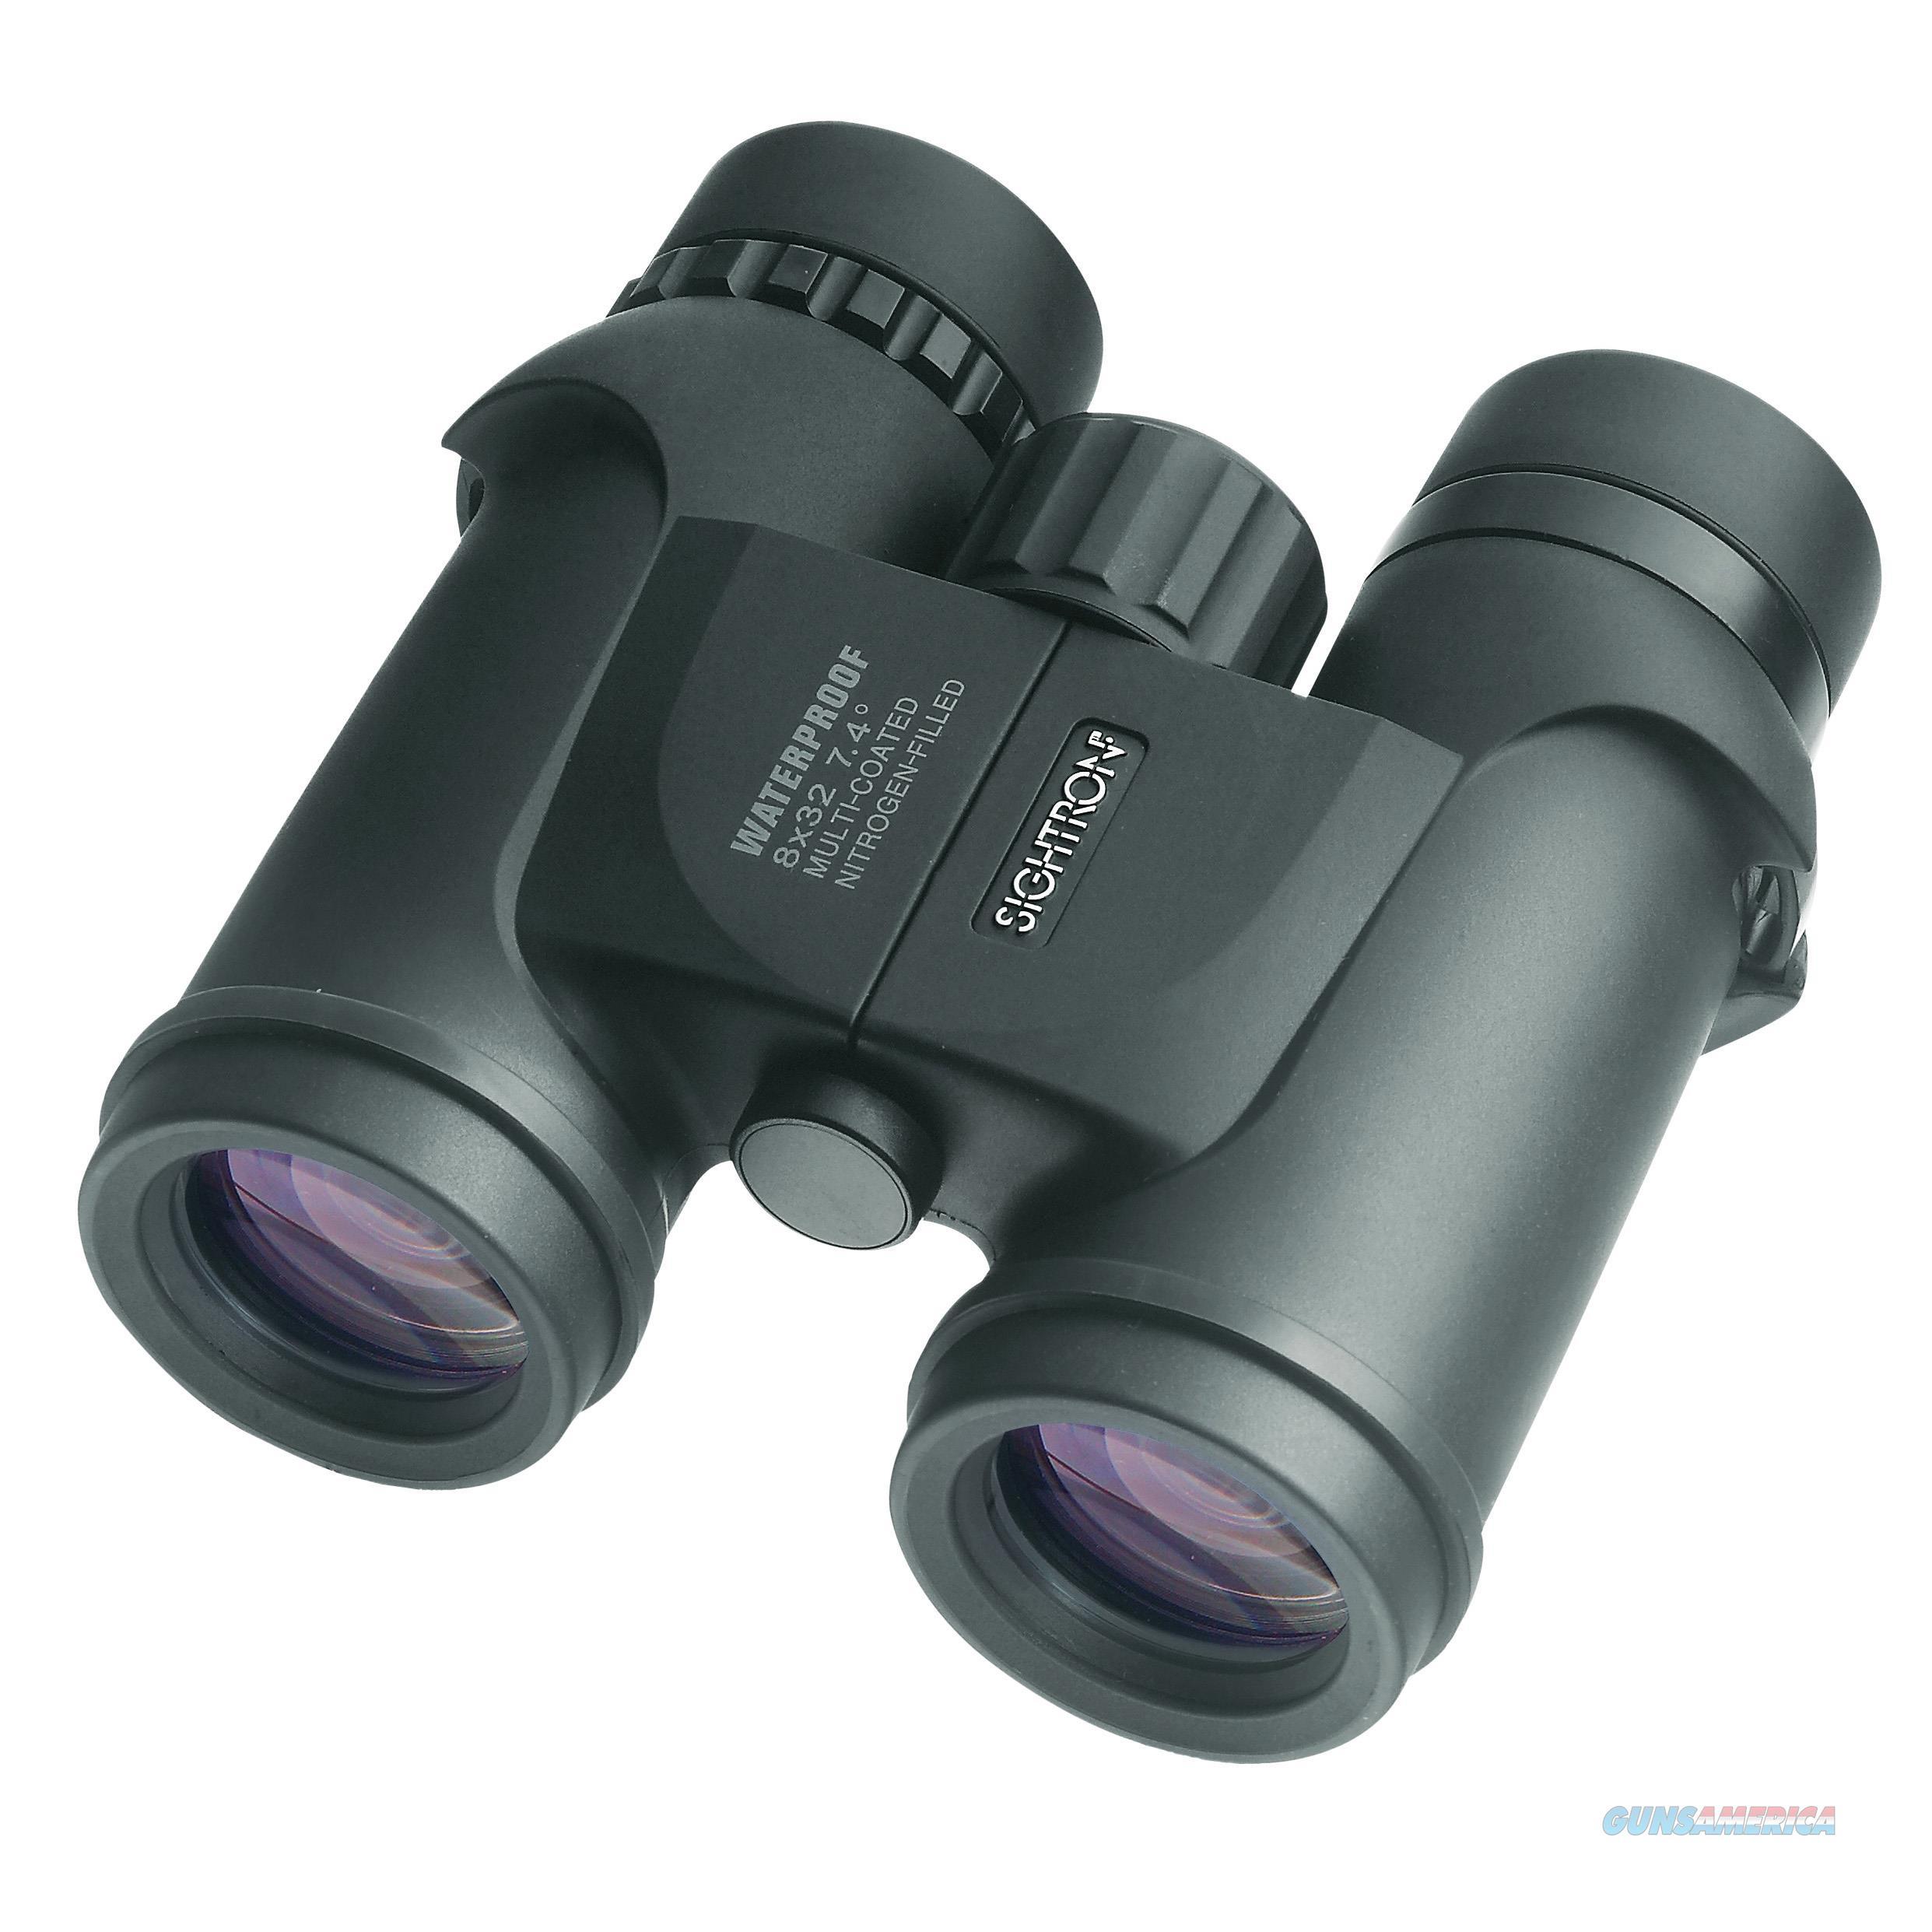 Sightron, Inc. Si Series Binocular Roof Prism 30004  Non-Guns > Scopes/Mounts/Rings & Optics > Non-Scope Optics > Binoculars